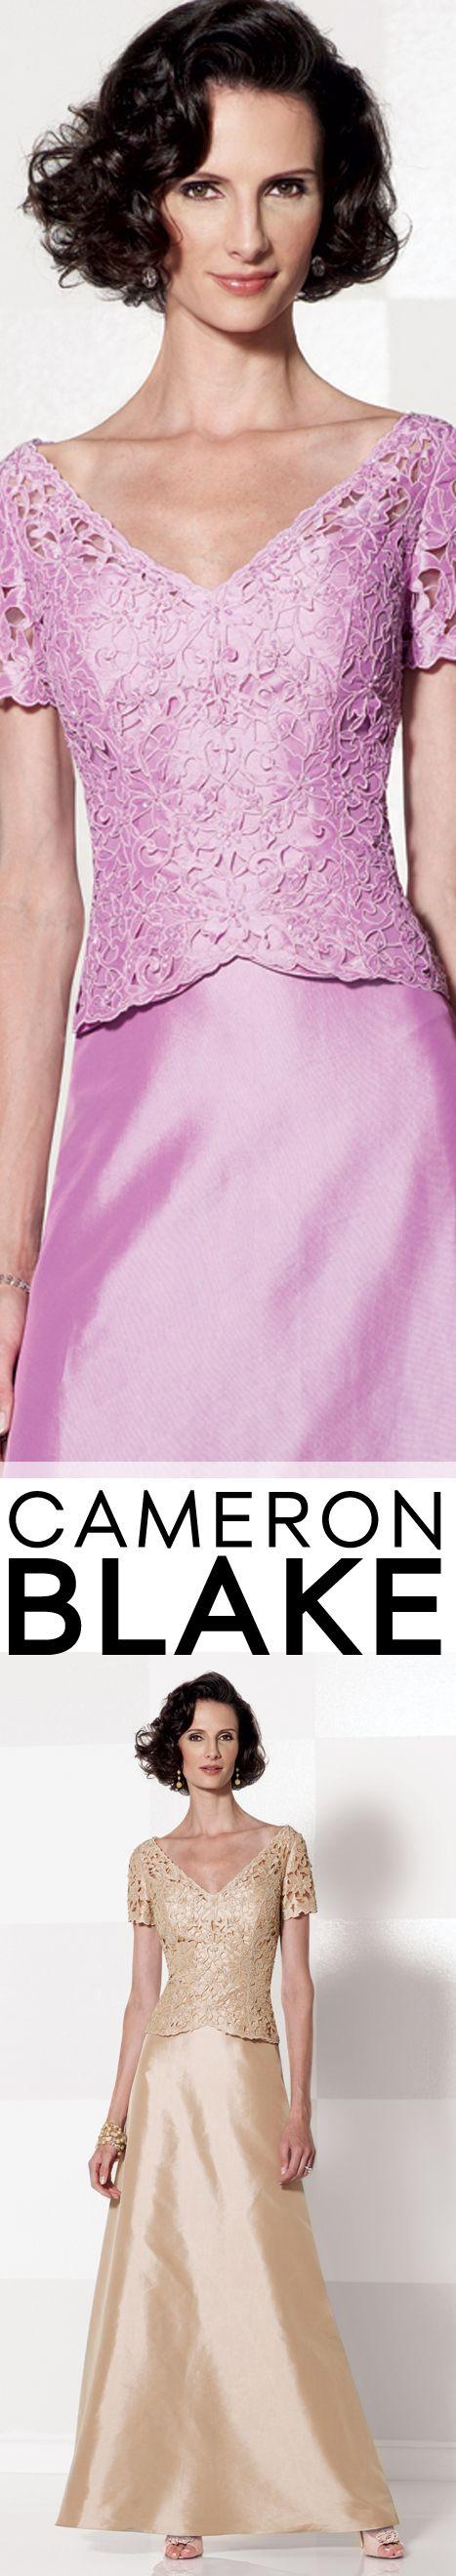 14 mejores imágenes de dresses en Pinterest   Vestidos de novia ...